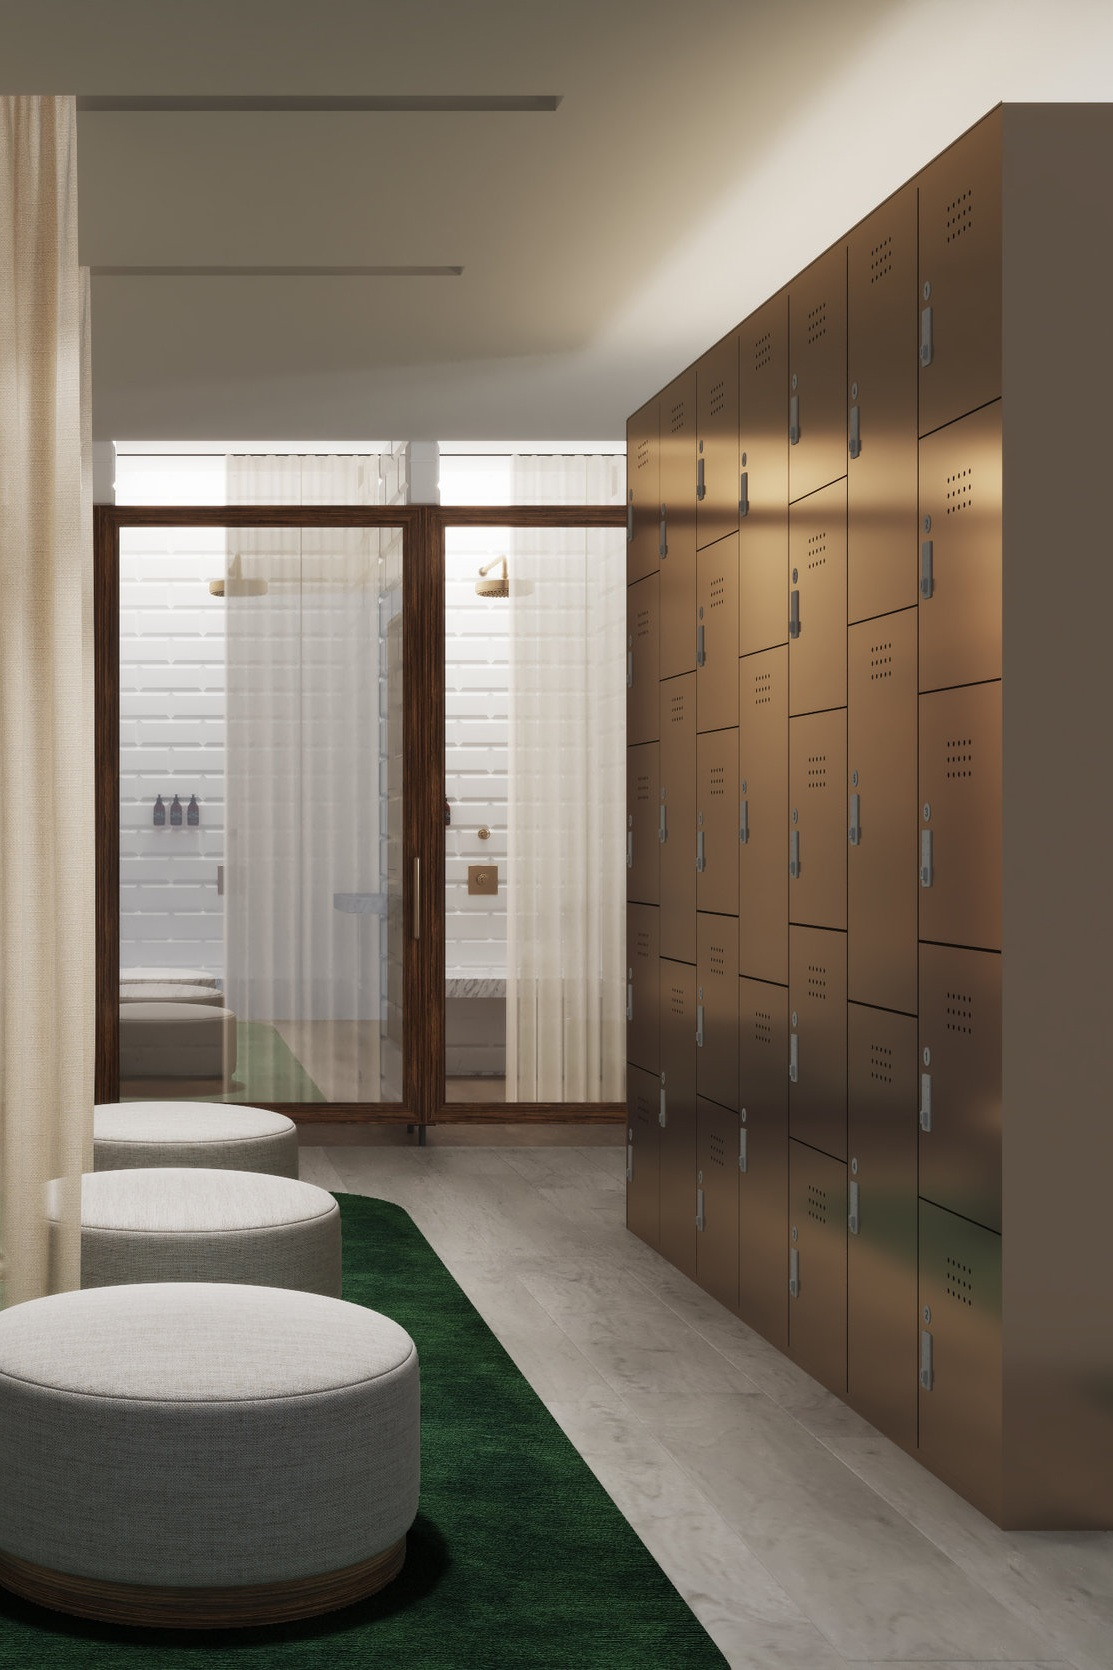 FINAL_bathrooms_view1.jpg